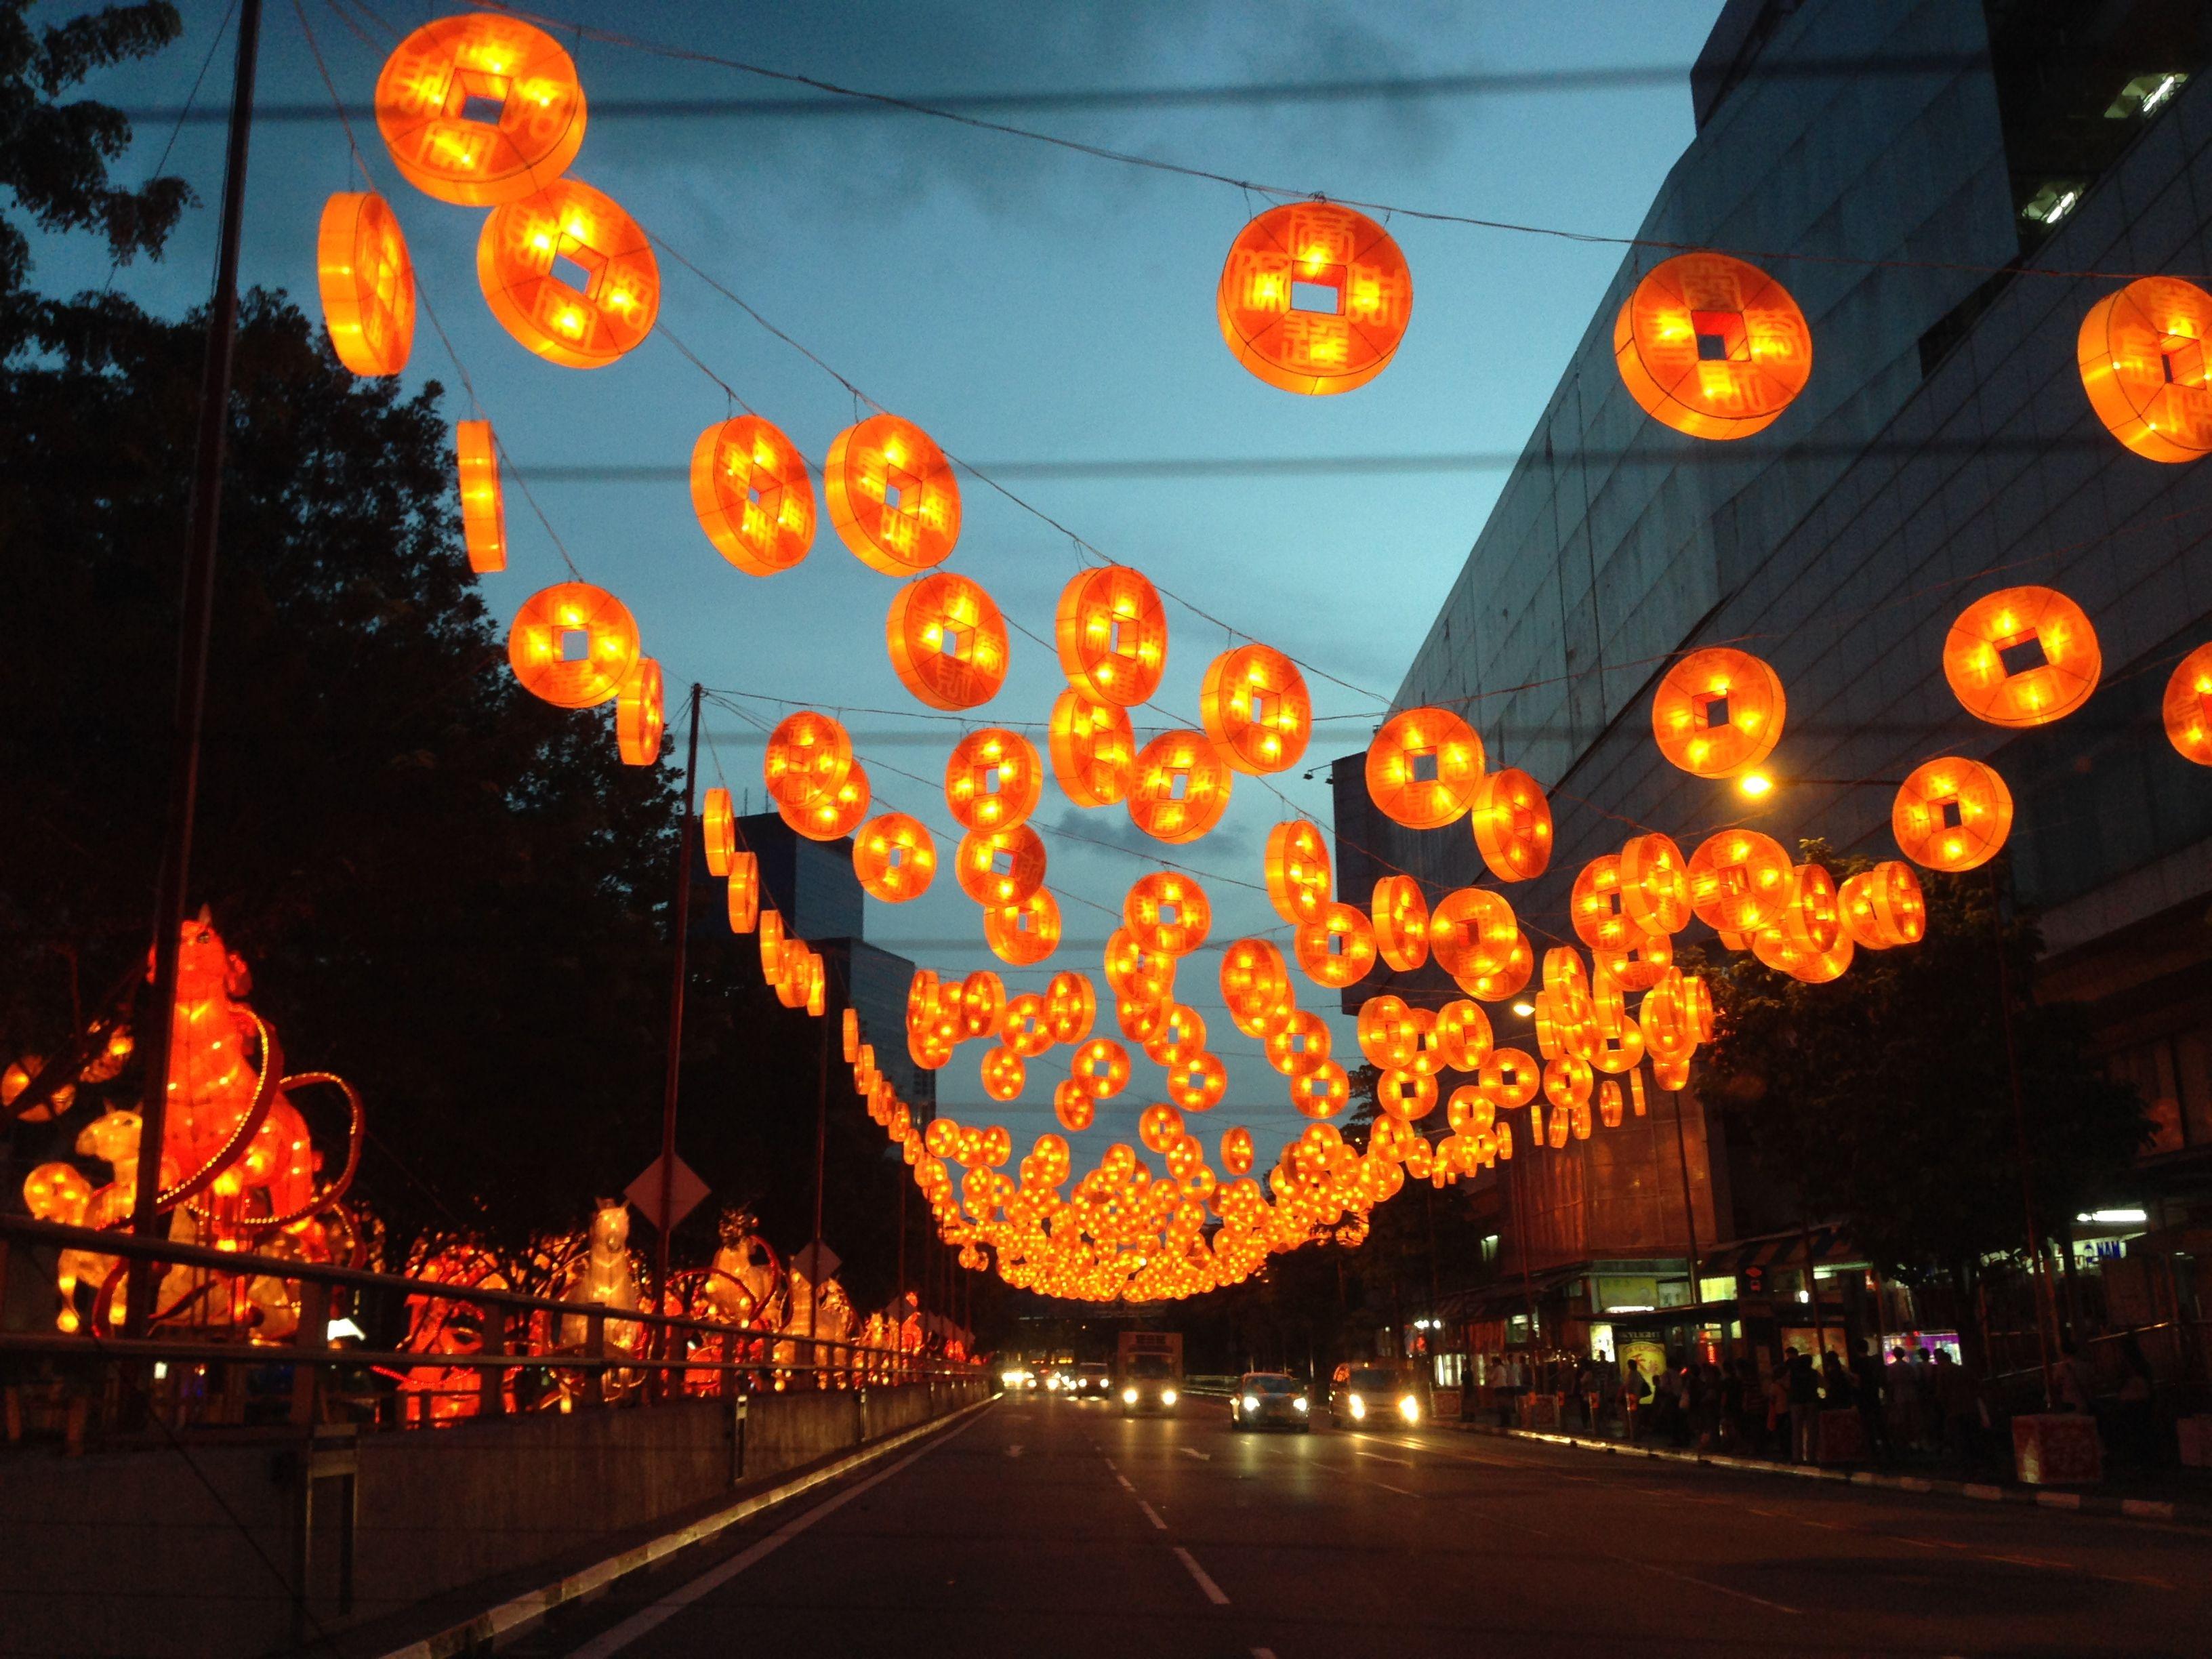 Chinese New Year | Chinese new year, Fair grounds, Singapore